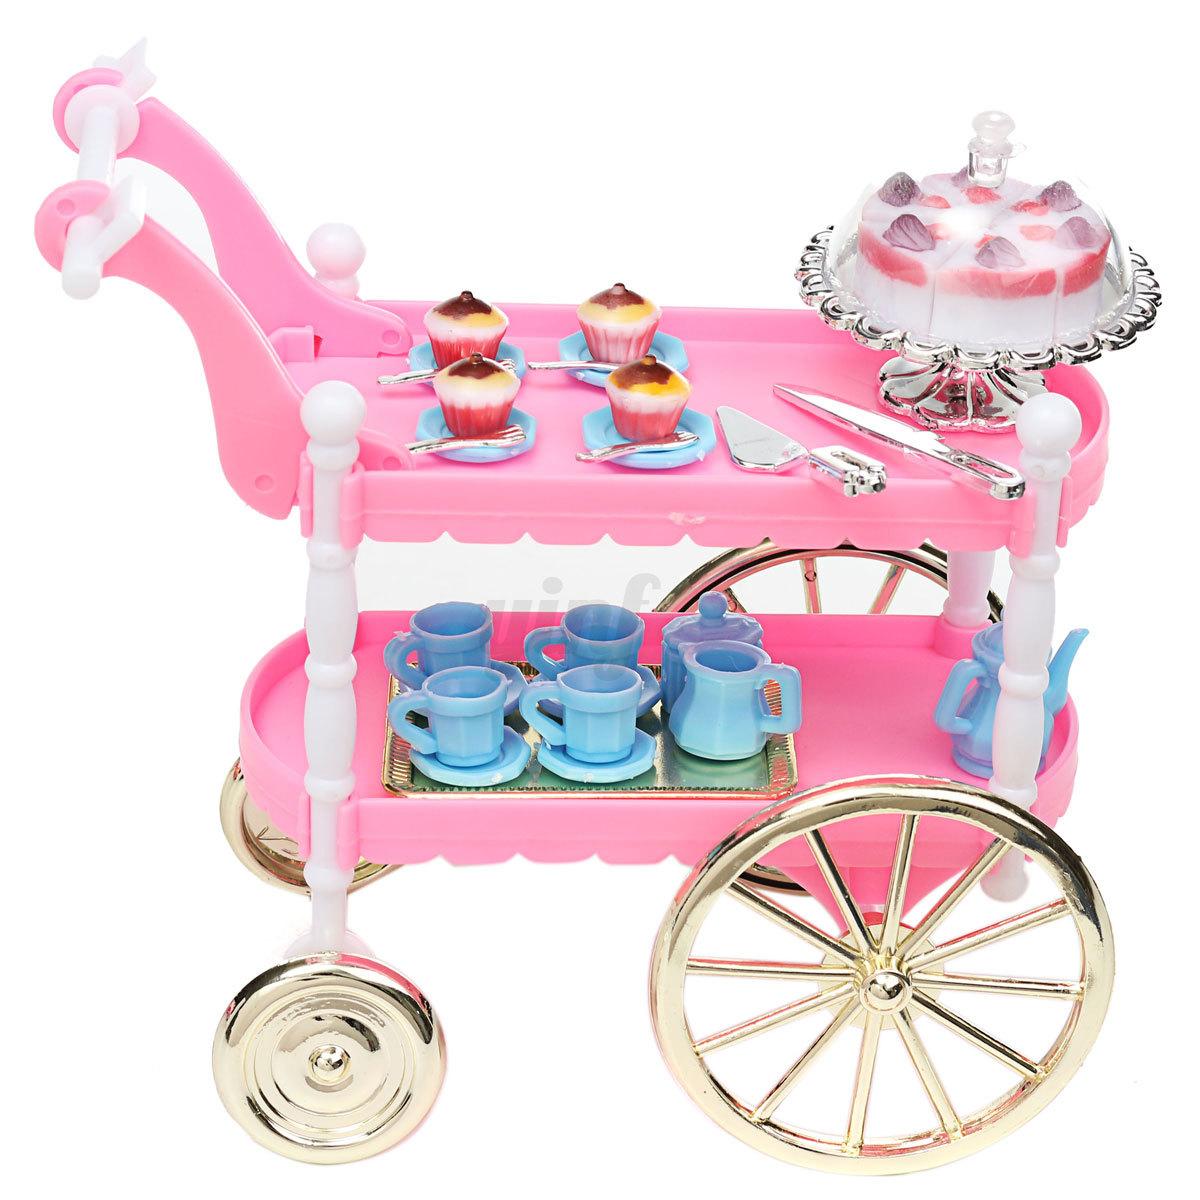 Barbie doll house furniture - Furniture Birthday Cake Tea Car Trolley Canteen For